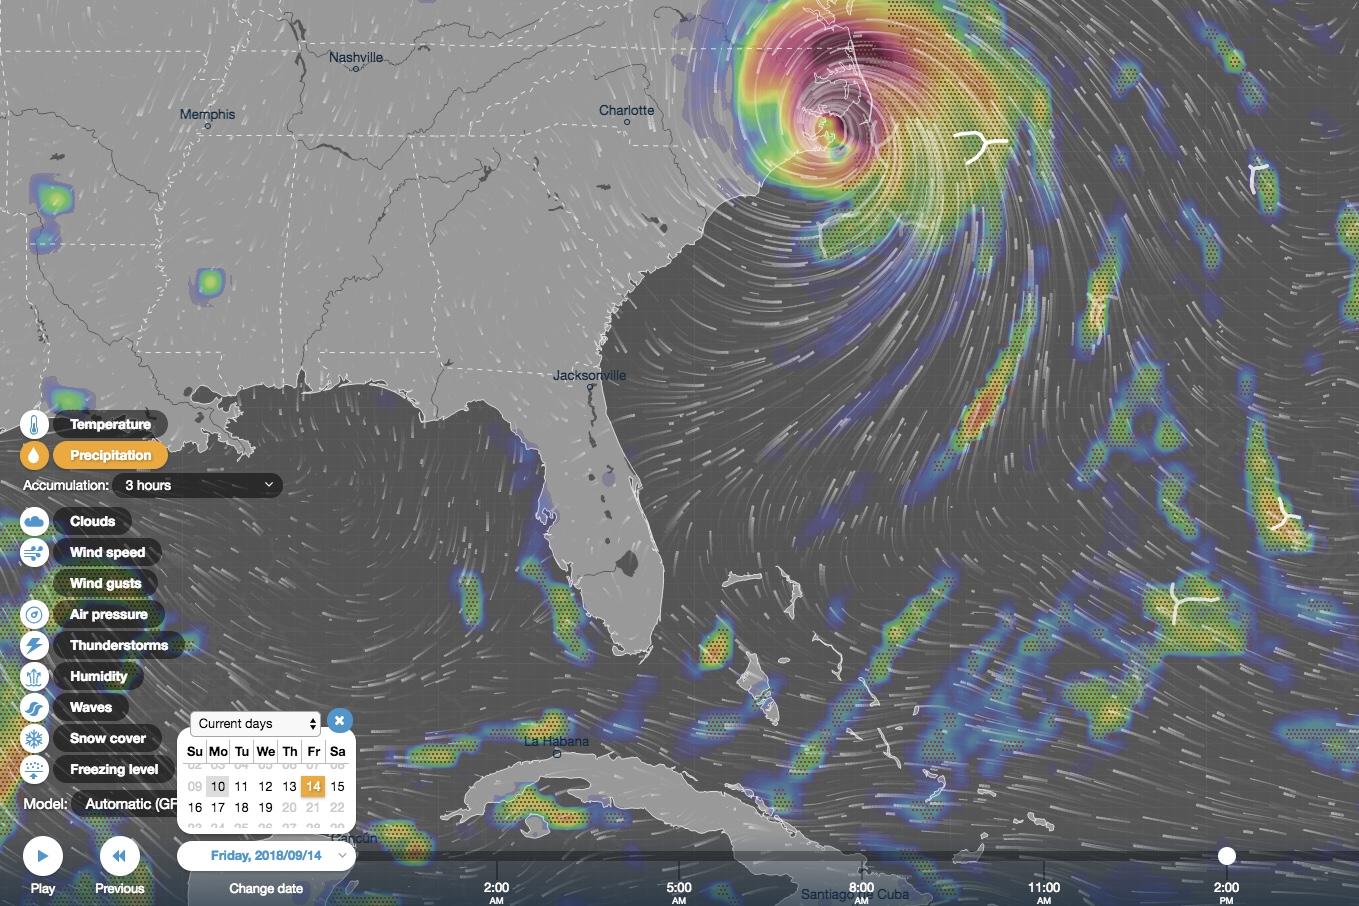 flooding,130mph winds,NHC,state of emergency,category 4 hurricane,hurricane florence,News,